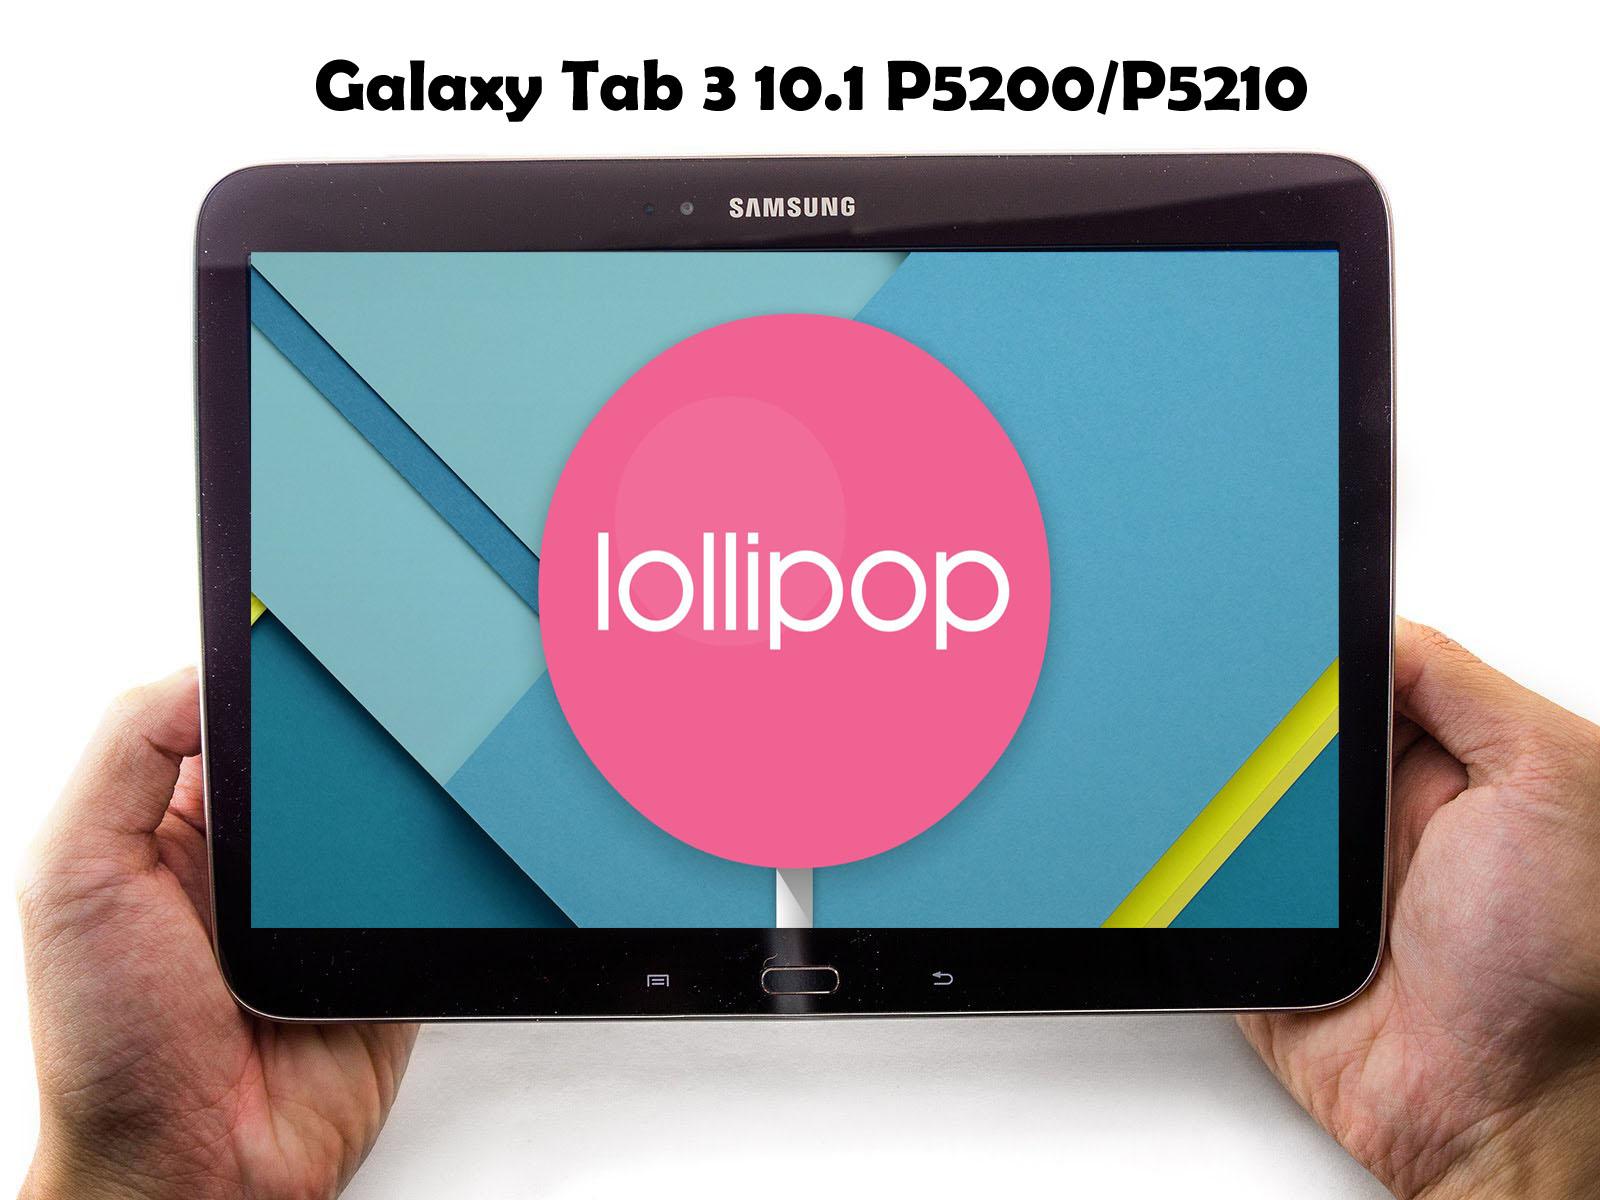 Samsung Galaxy Tab 3 10 1 P5200 / P5210 / P5220 Unofficial